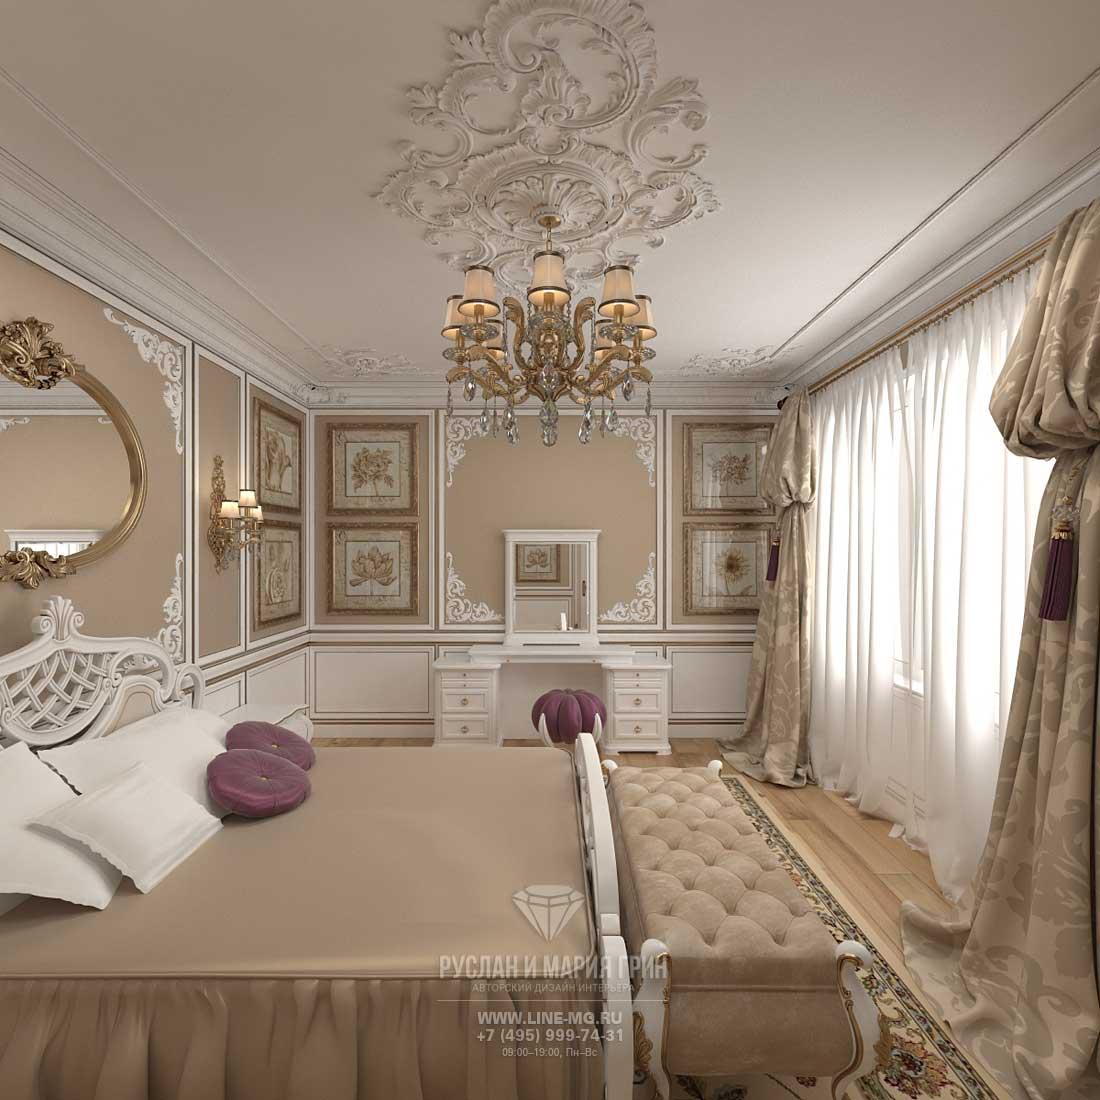 Дизайн спальни. Фото 2016